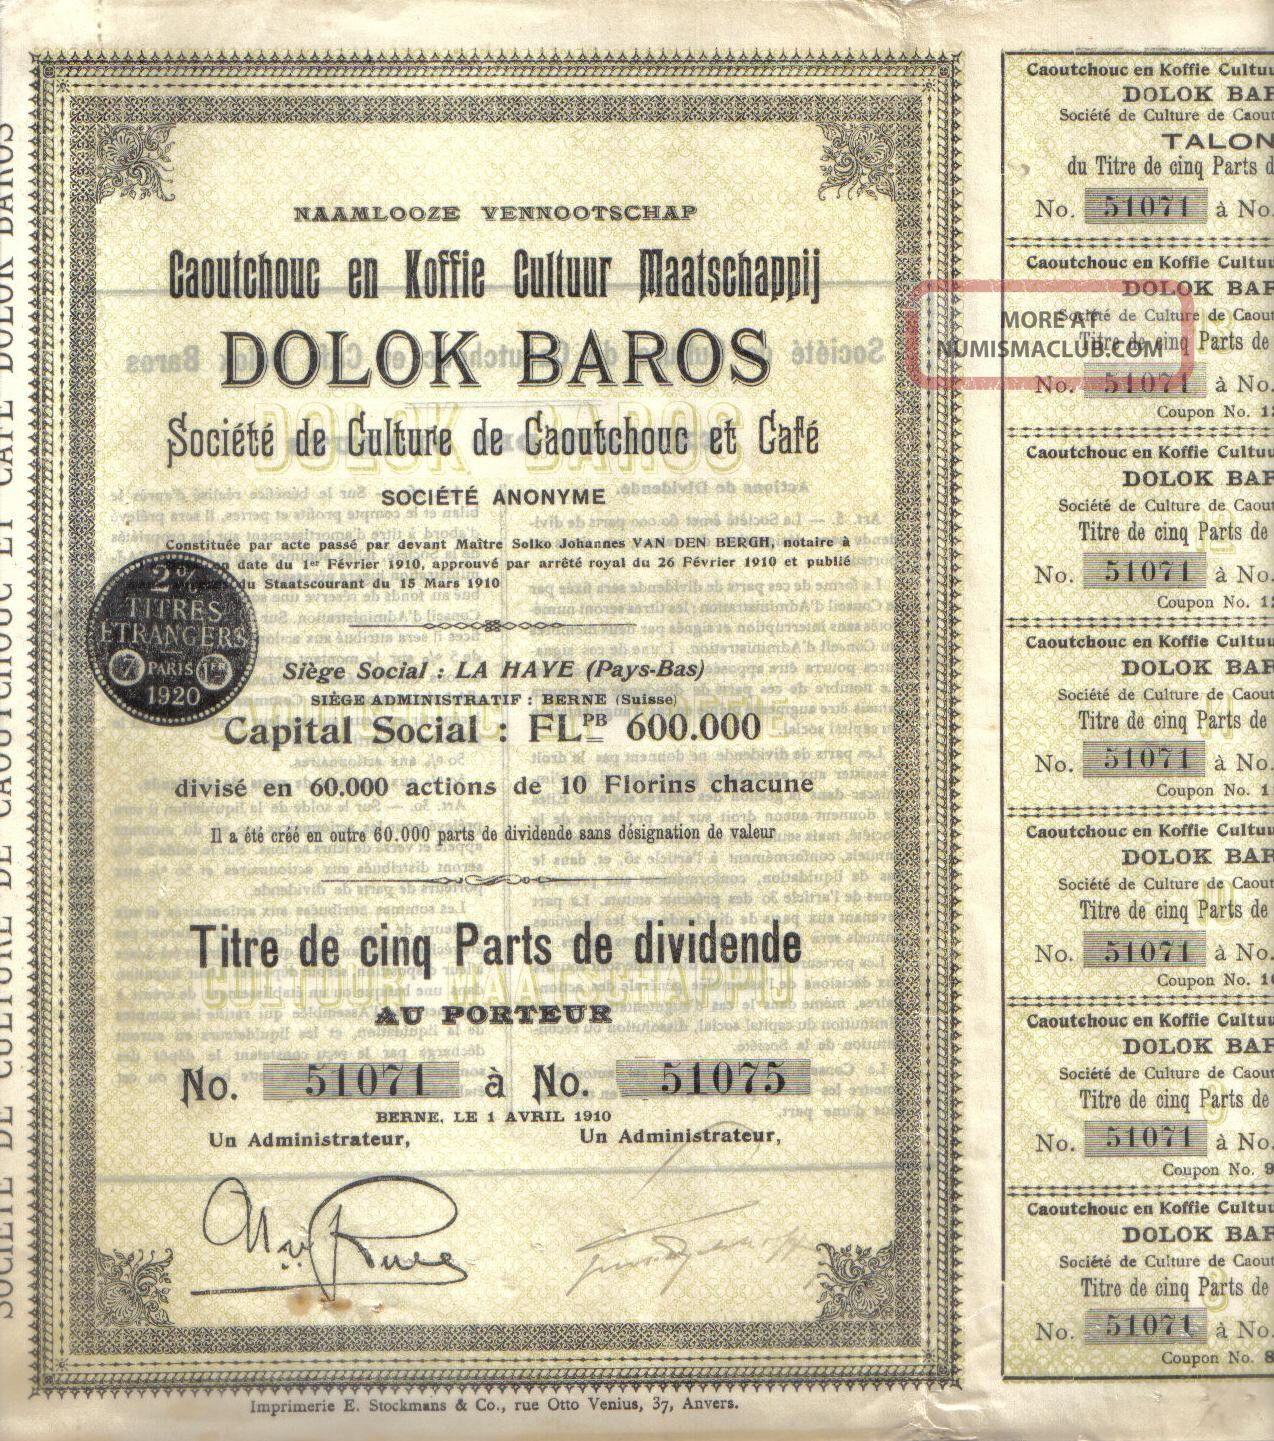 Netherlands Sumatra 1927 Caoutchouc Rubber Coffee Dolok Baros Co Uncancelled